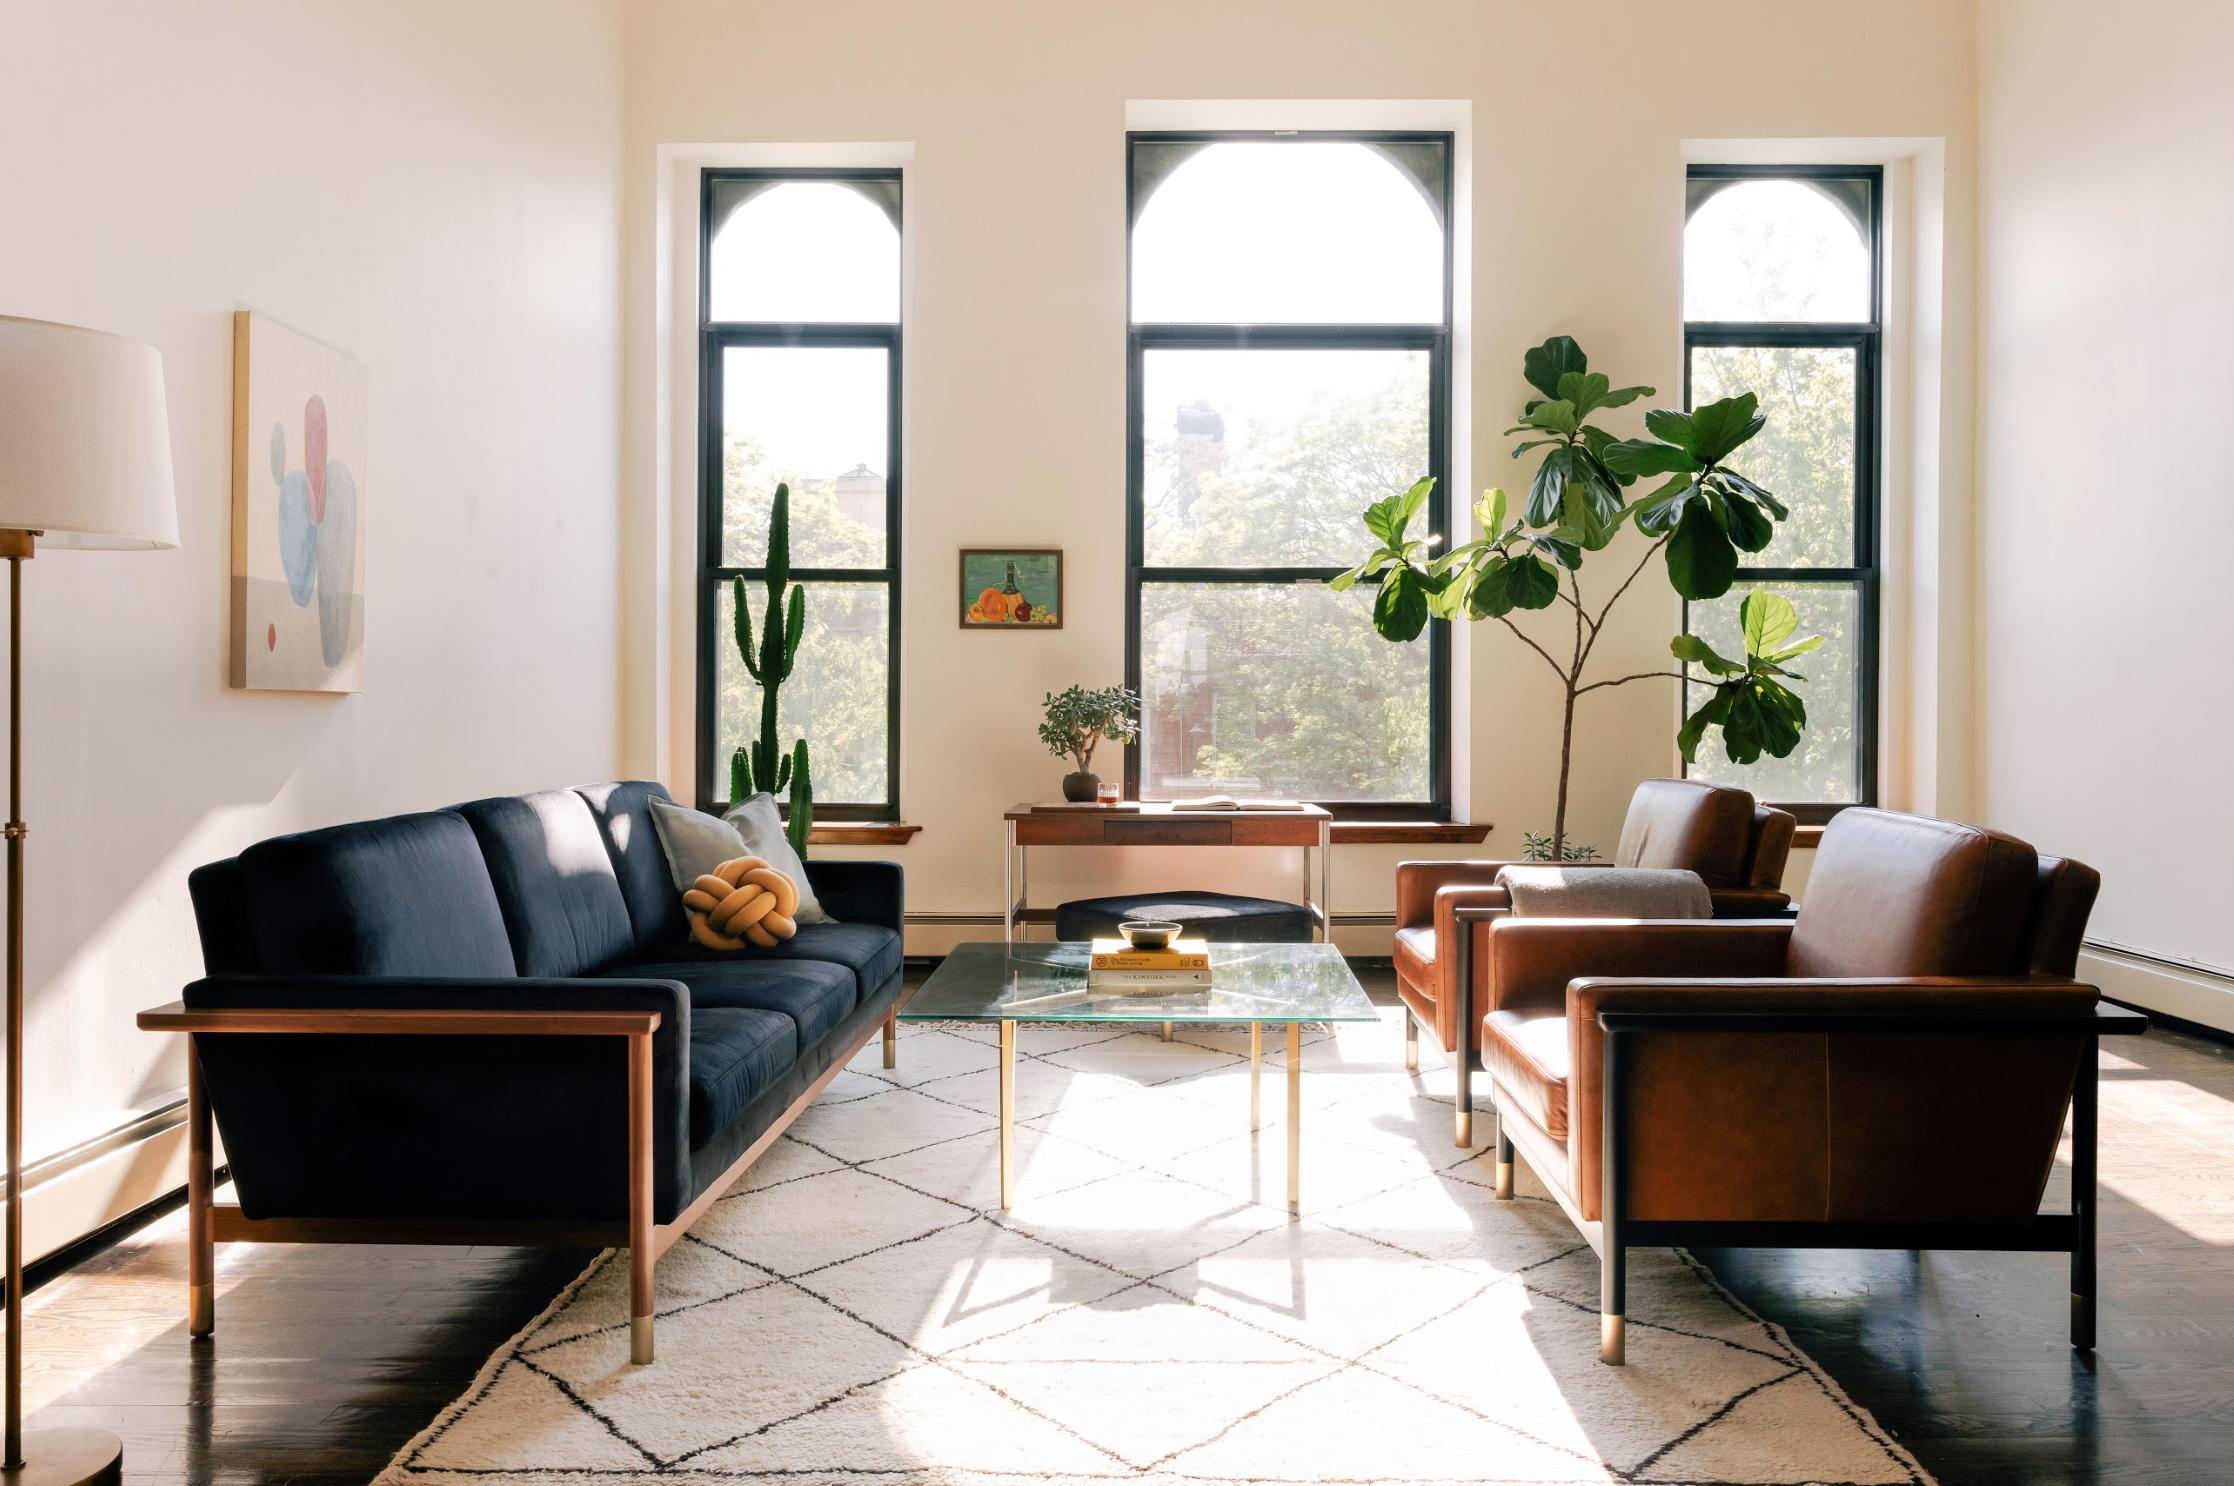 Two sofas in sunlit living room